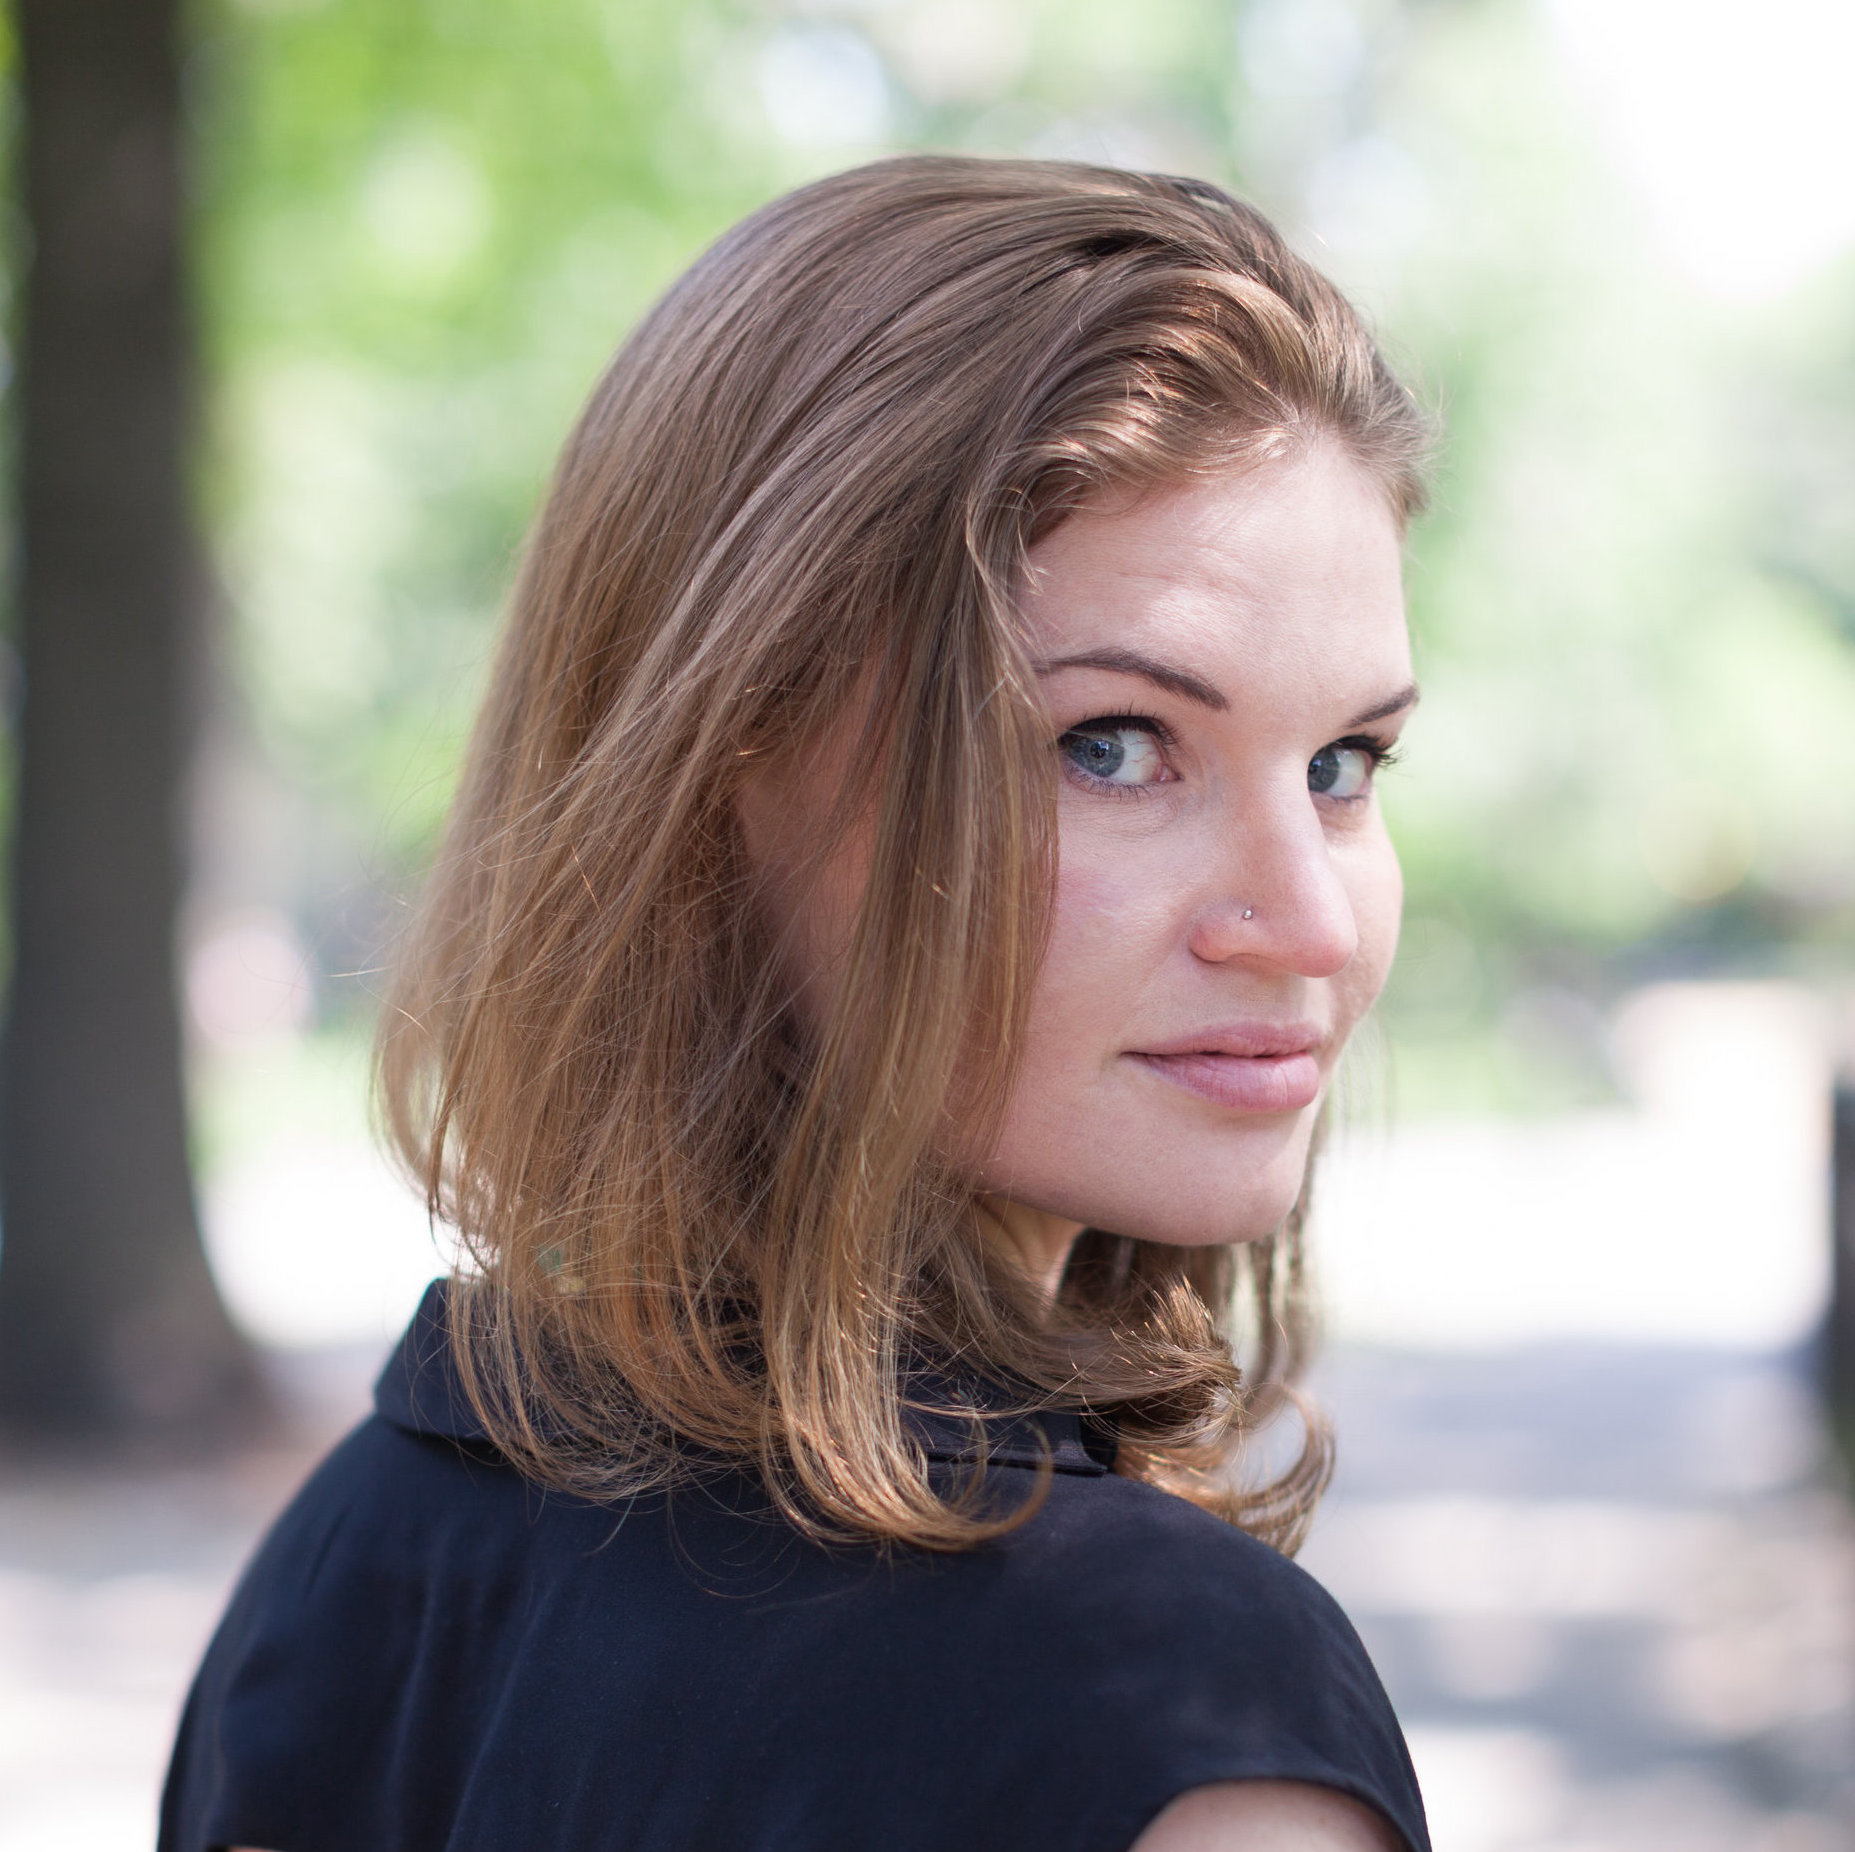 Alexandra Ostrow